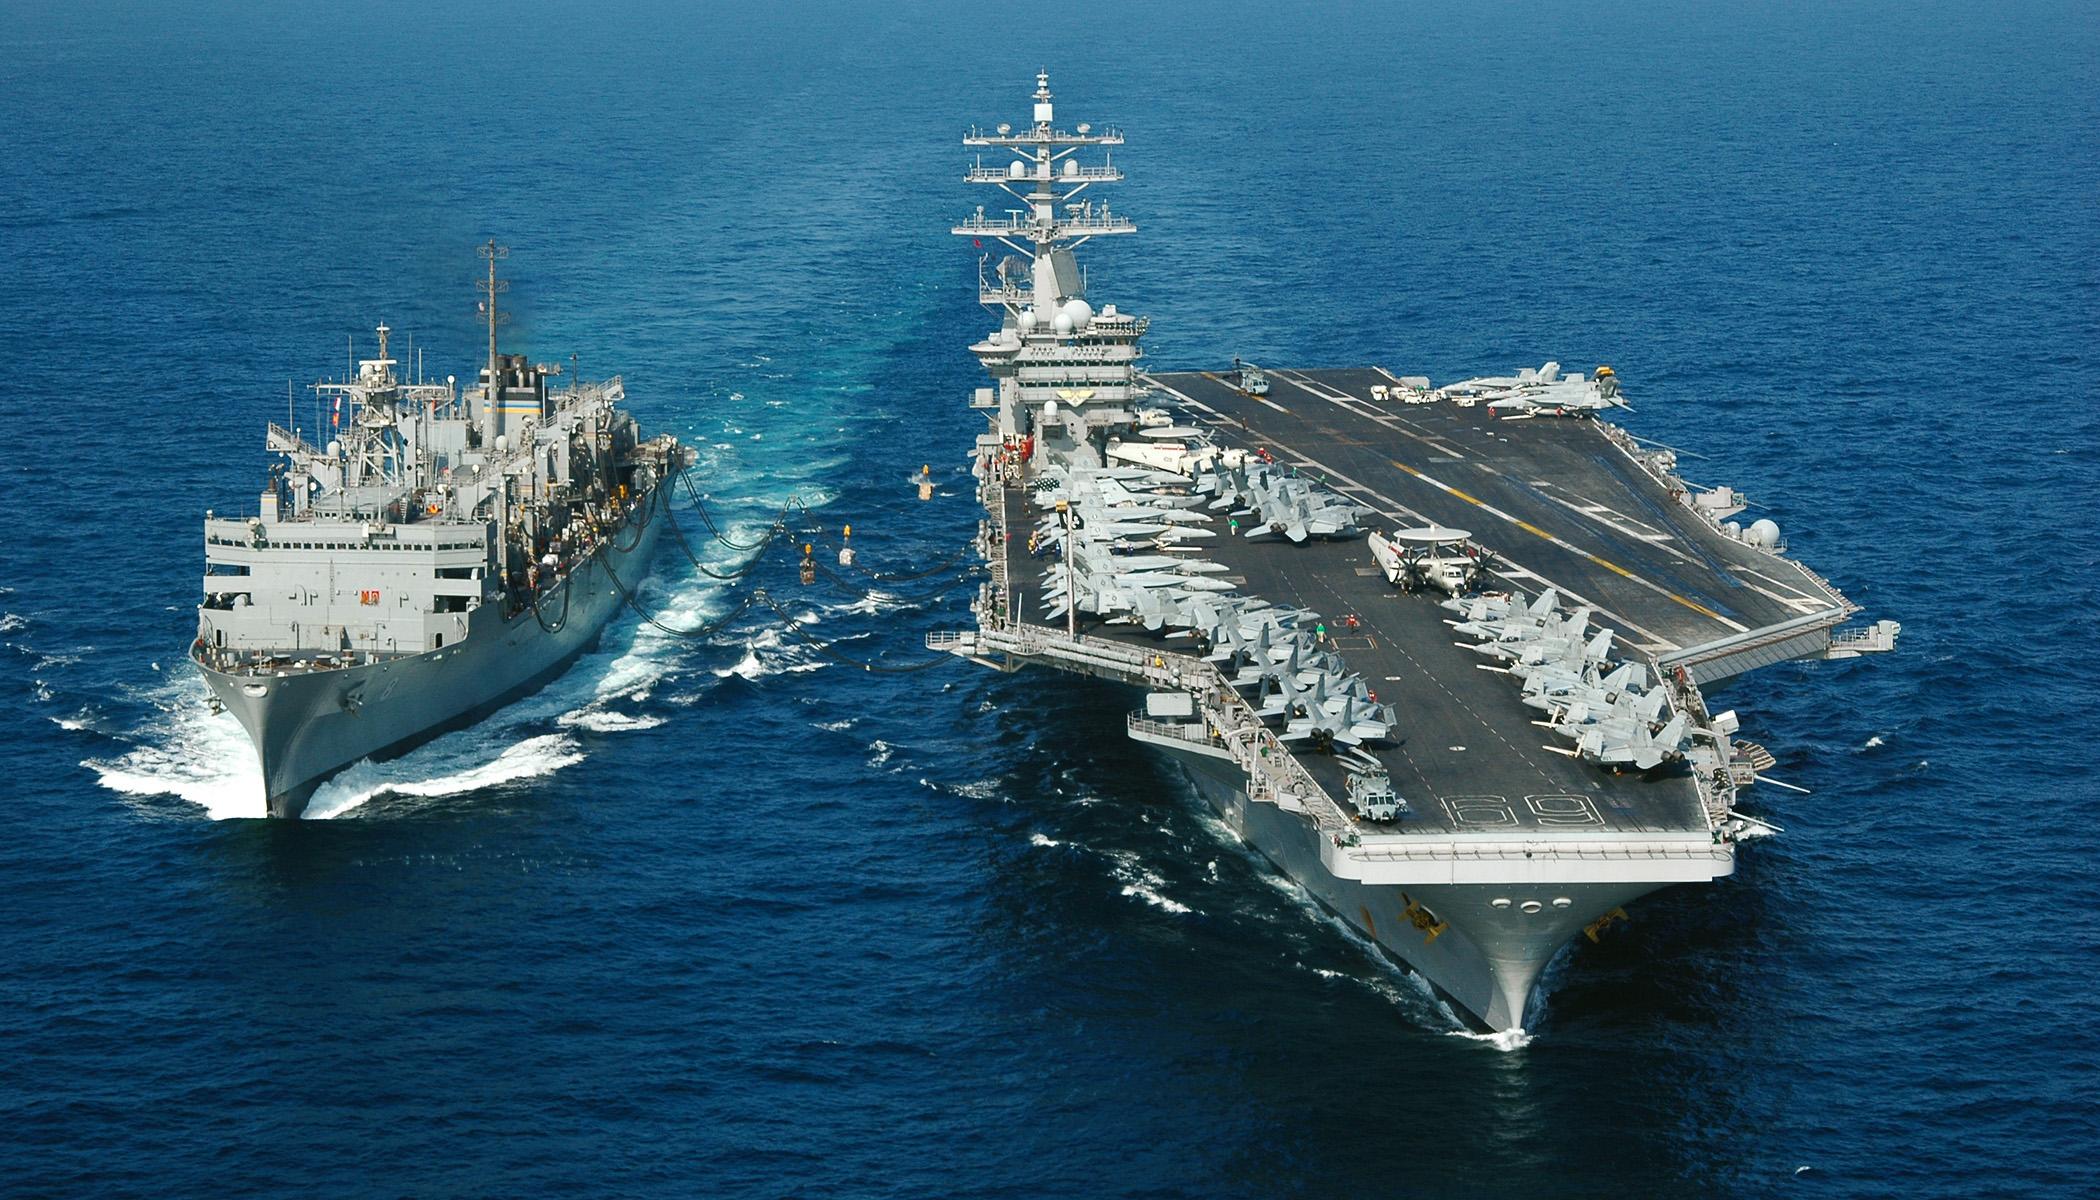 INS Vikramaditya, Indian Air Force, Indian Navy, Indian Army, Pulwama attack, CRPF troopers, CRPF jawan, CRPF convoy, CRPF soldiers, Navy aircraft, India, Pakistan, National news